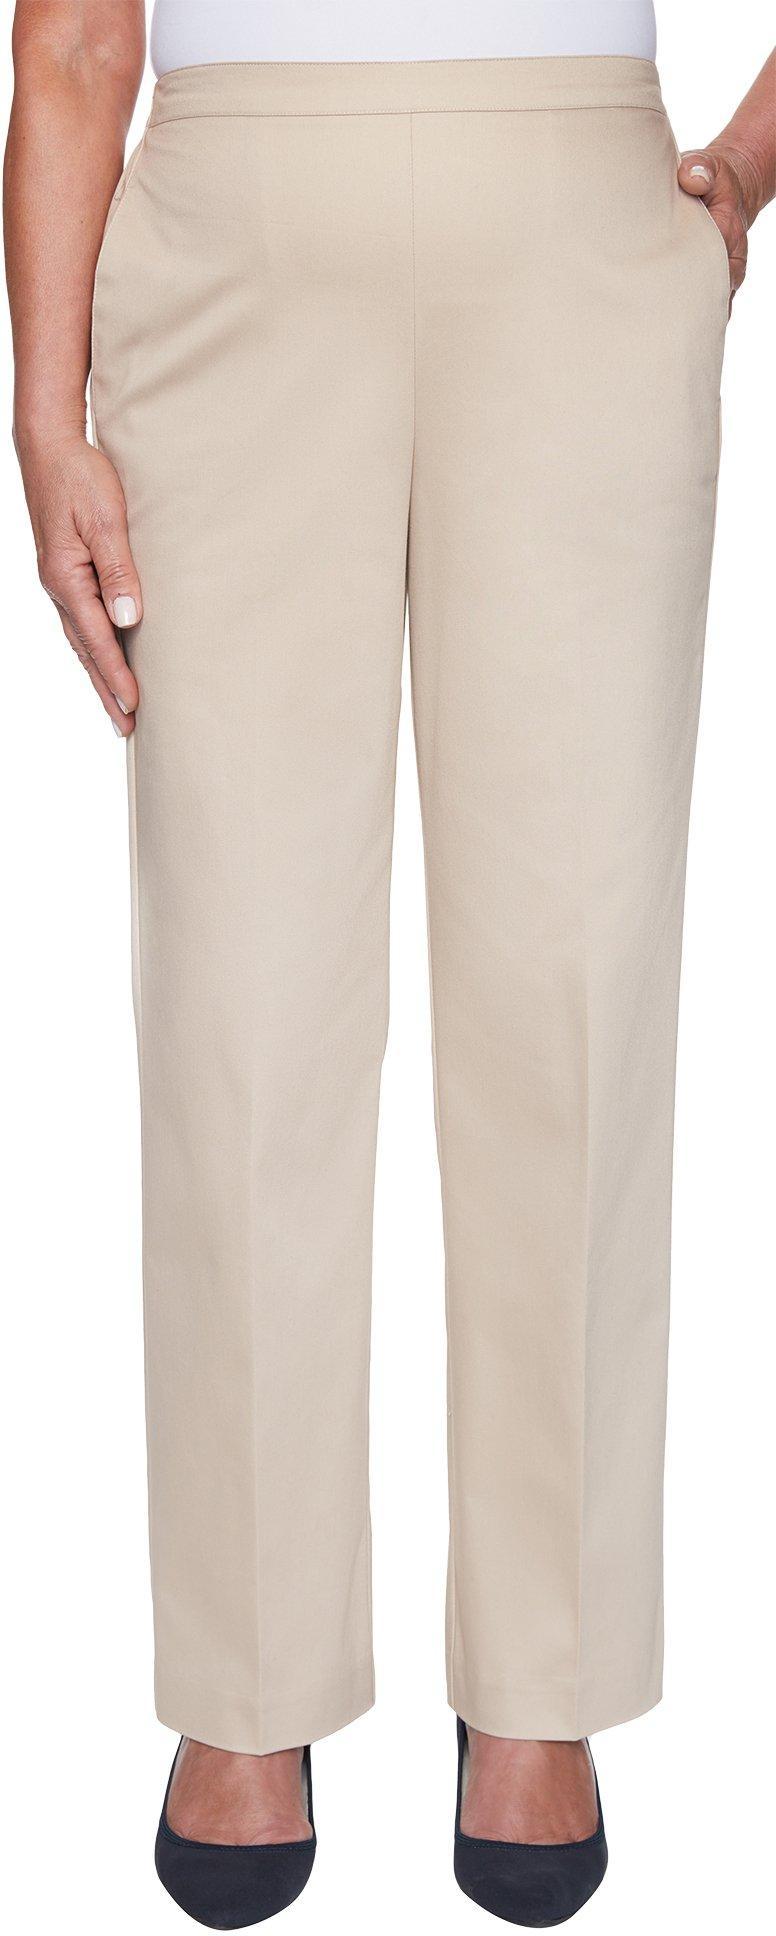 Counterparts Petite Bi-Stretch No Gap Pants